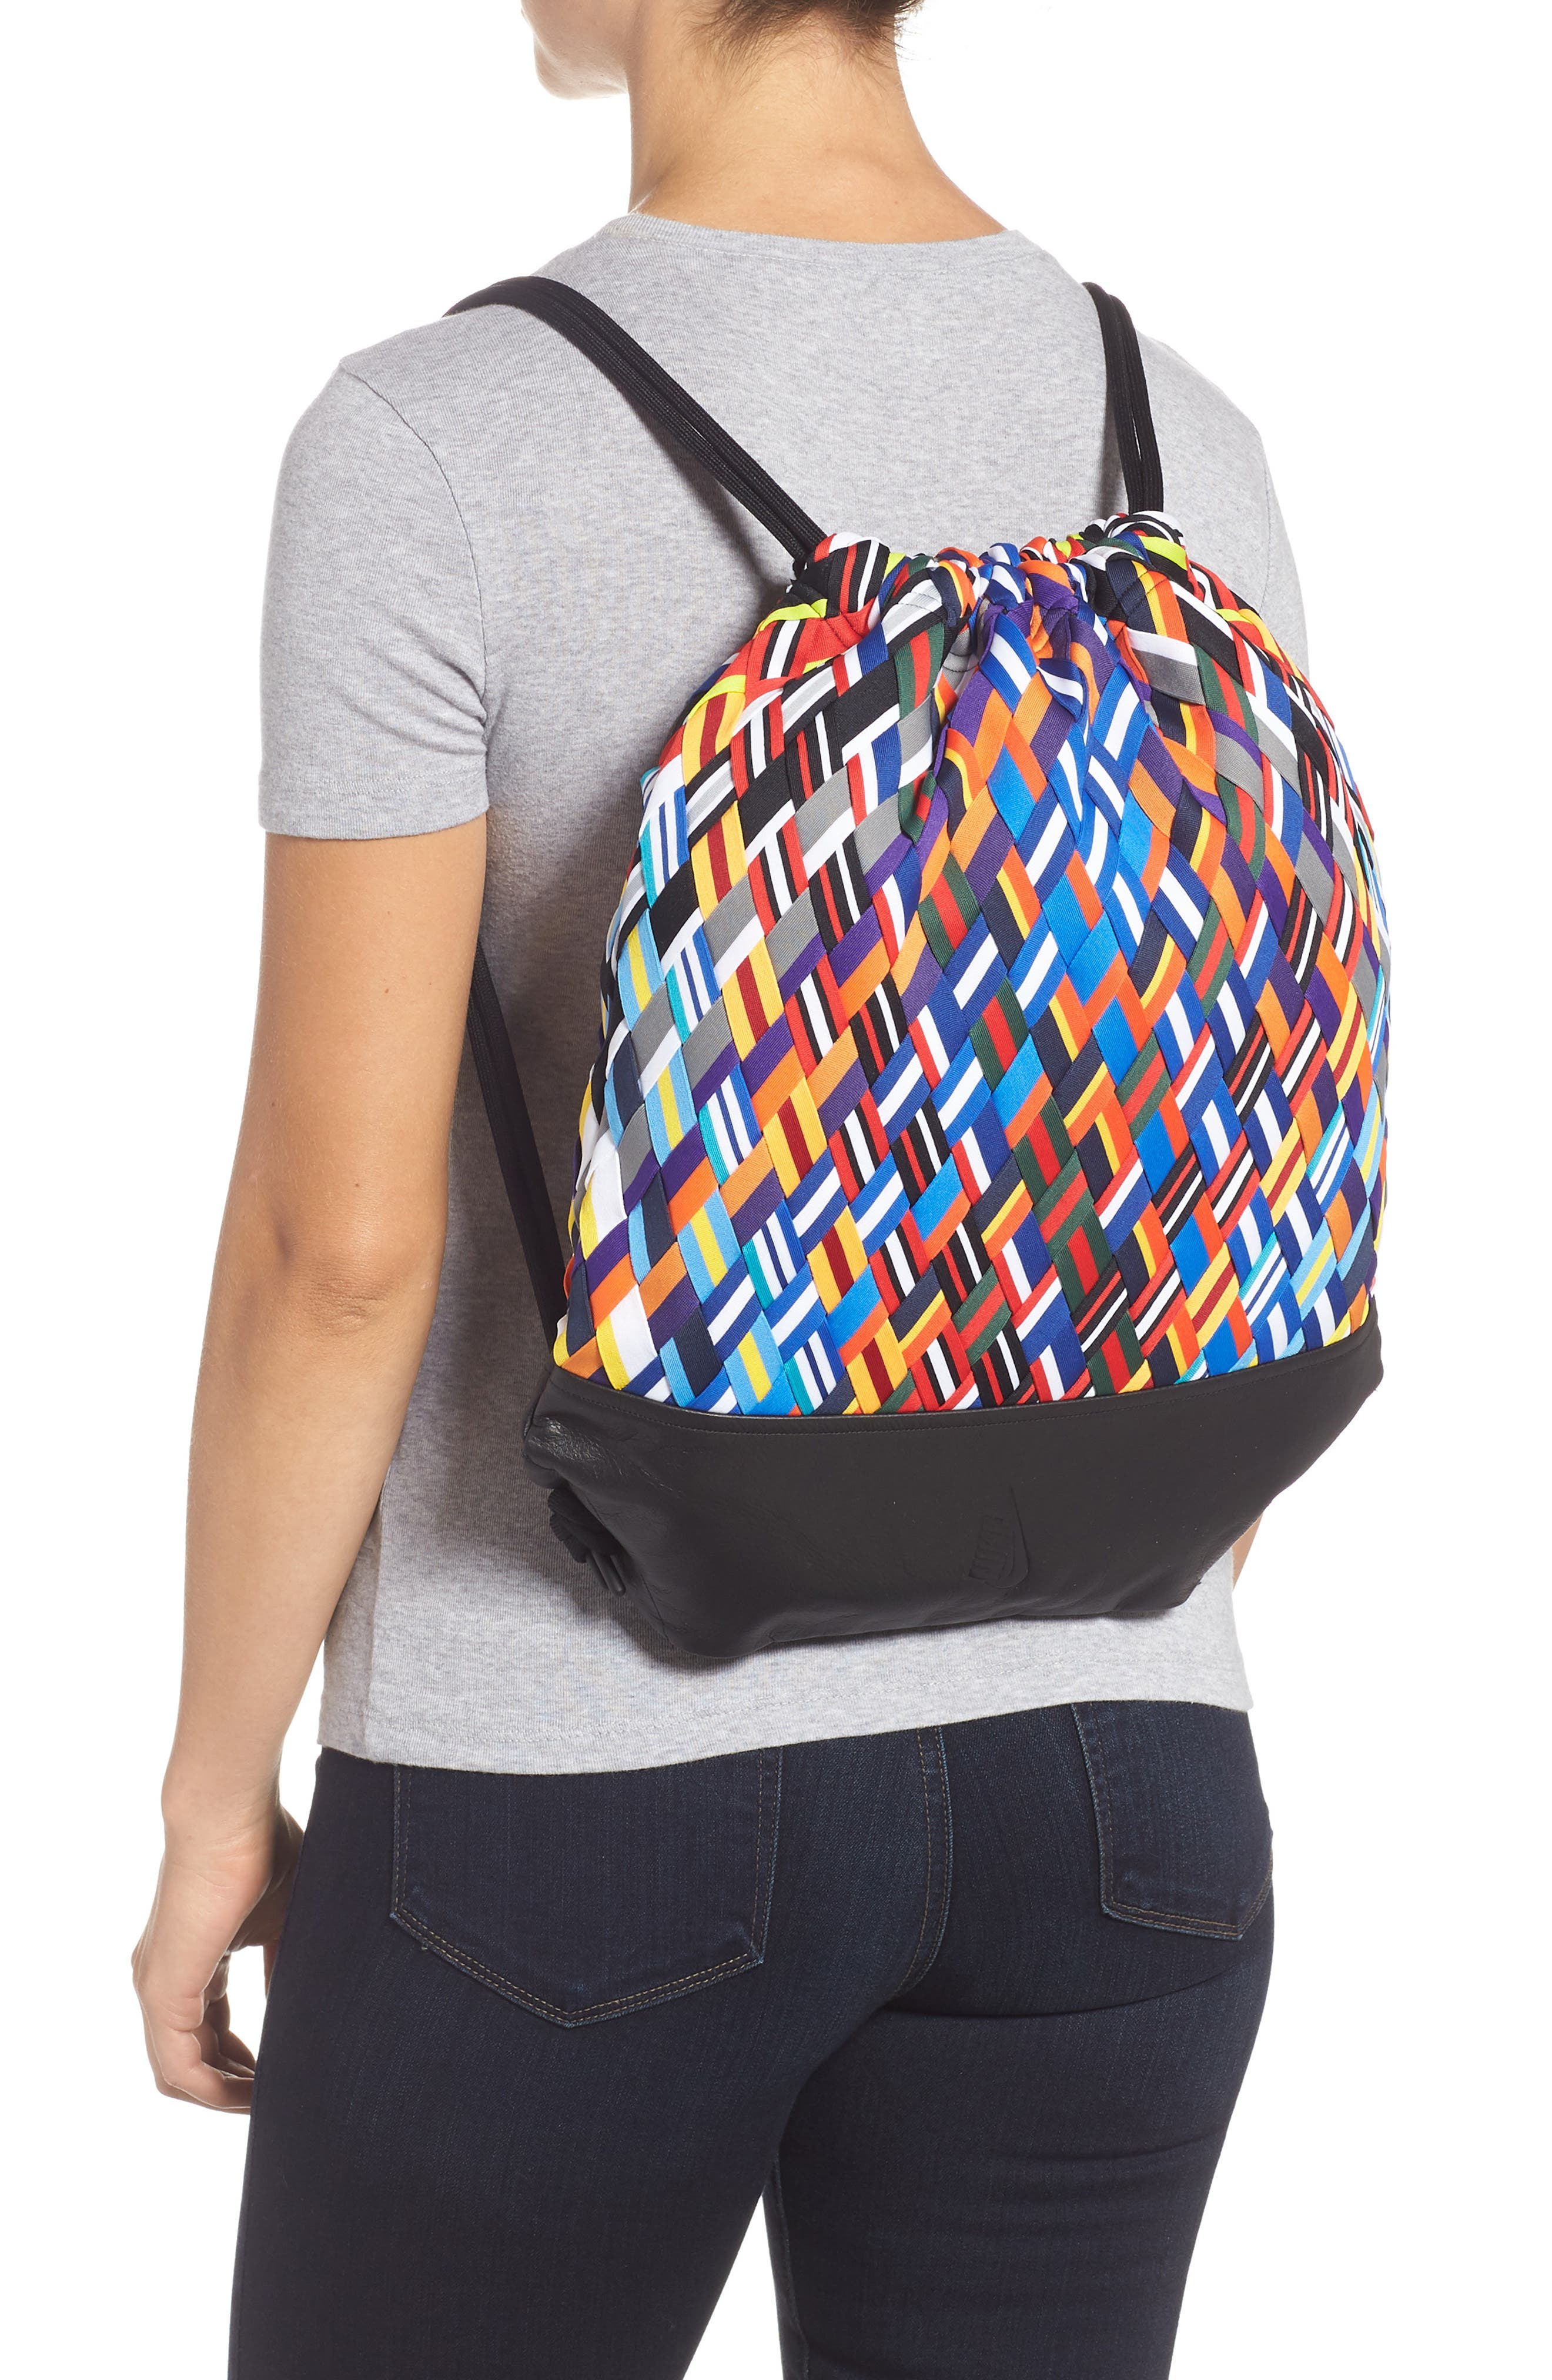 NIKE,                             NikeLab Basketball Backpack,                             Alternate thumbnail 2, color,                             BLACK